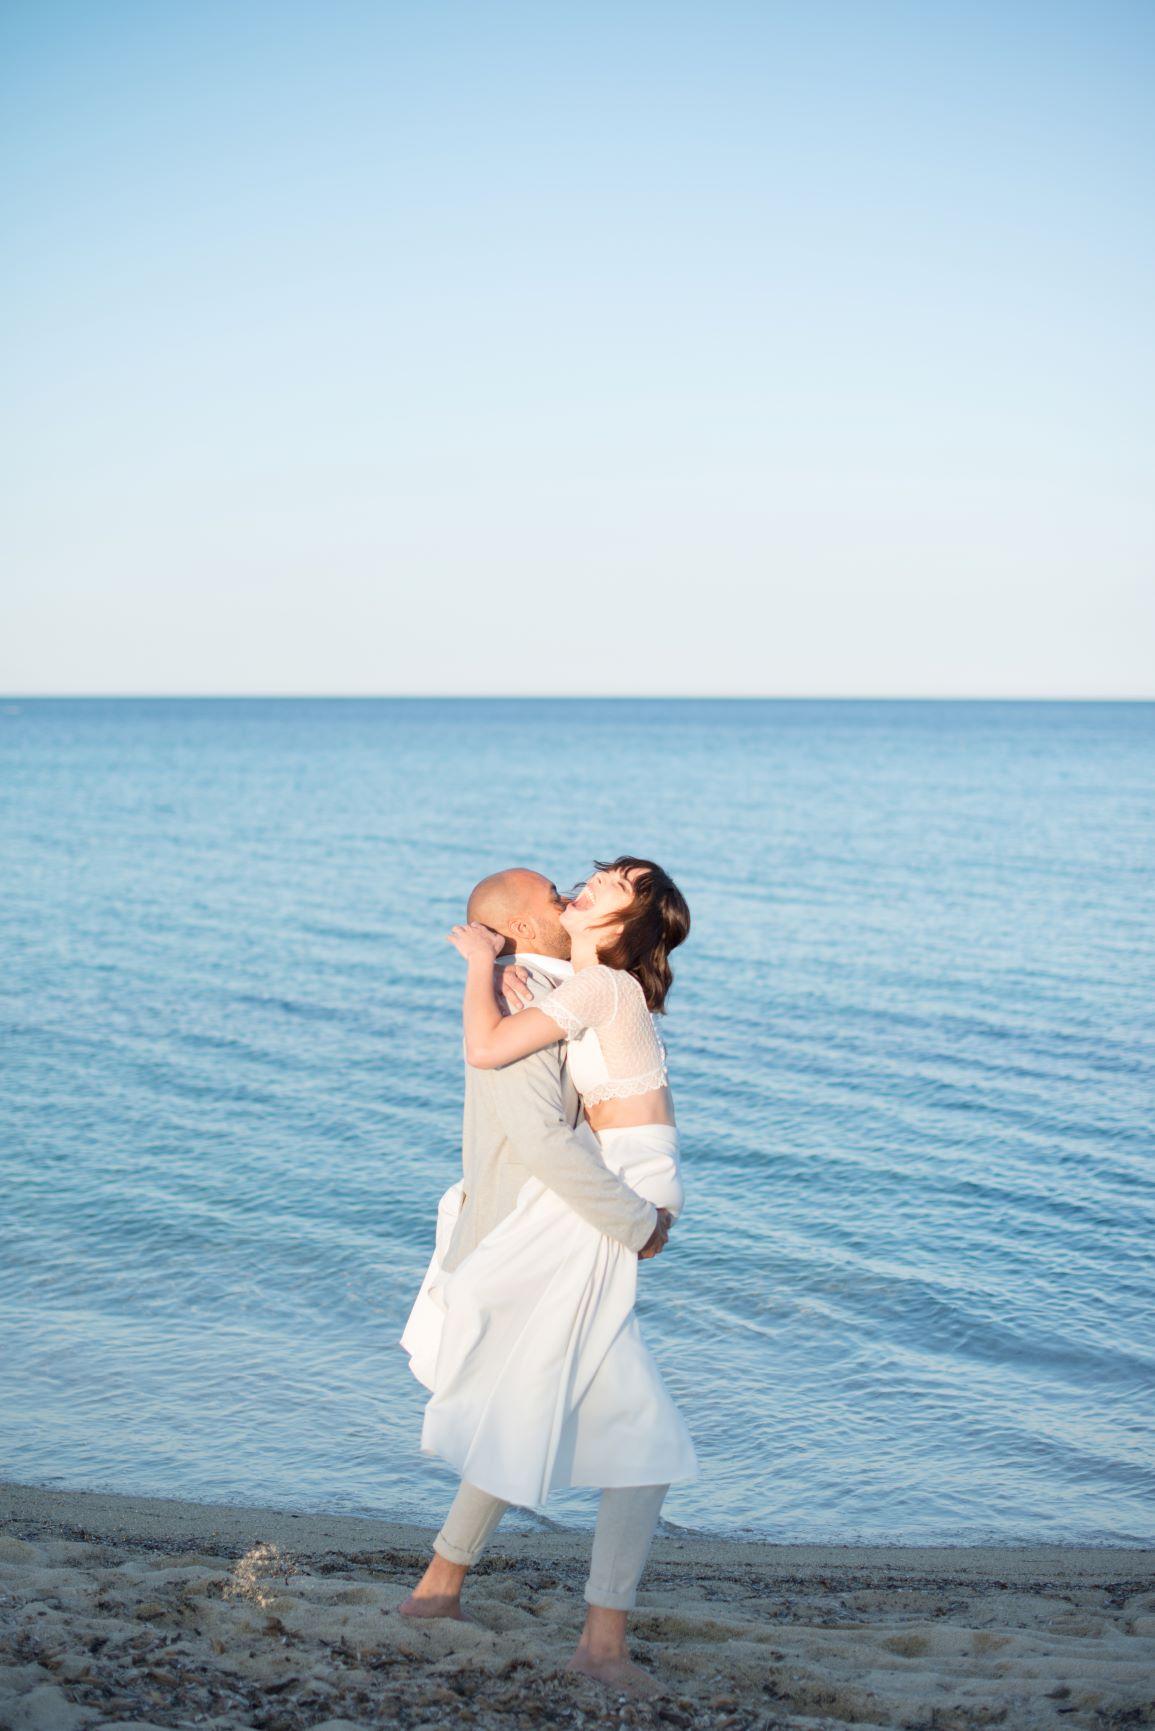 Mariage-cotedazur-Sainttropez-EmmanuelleMartyphotographe-90red